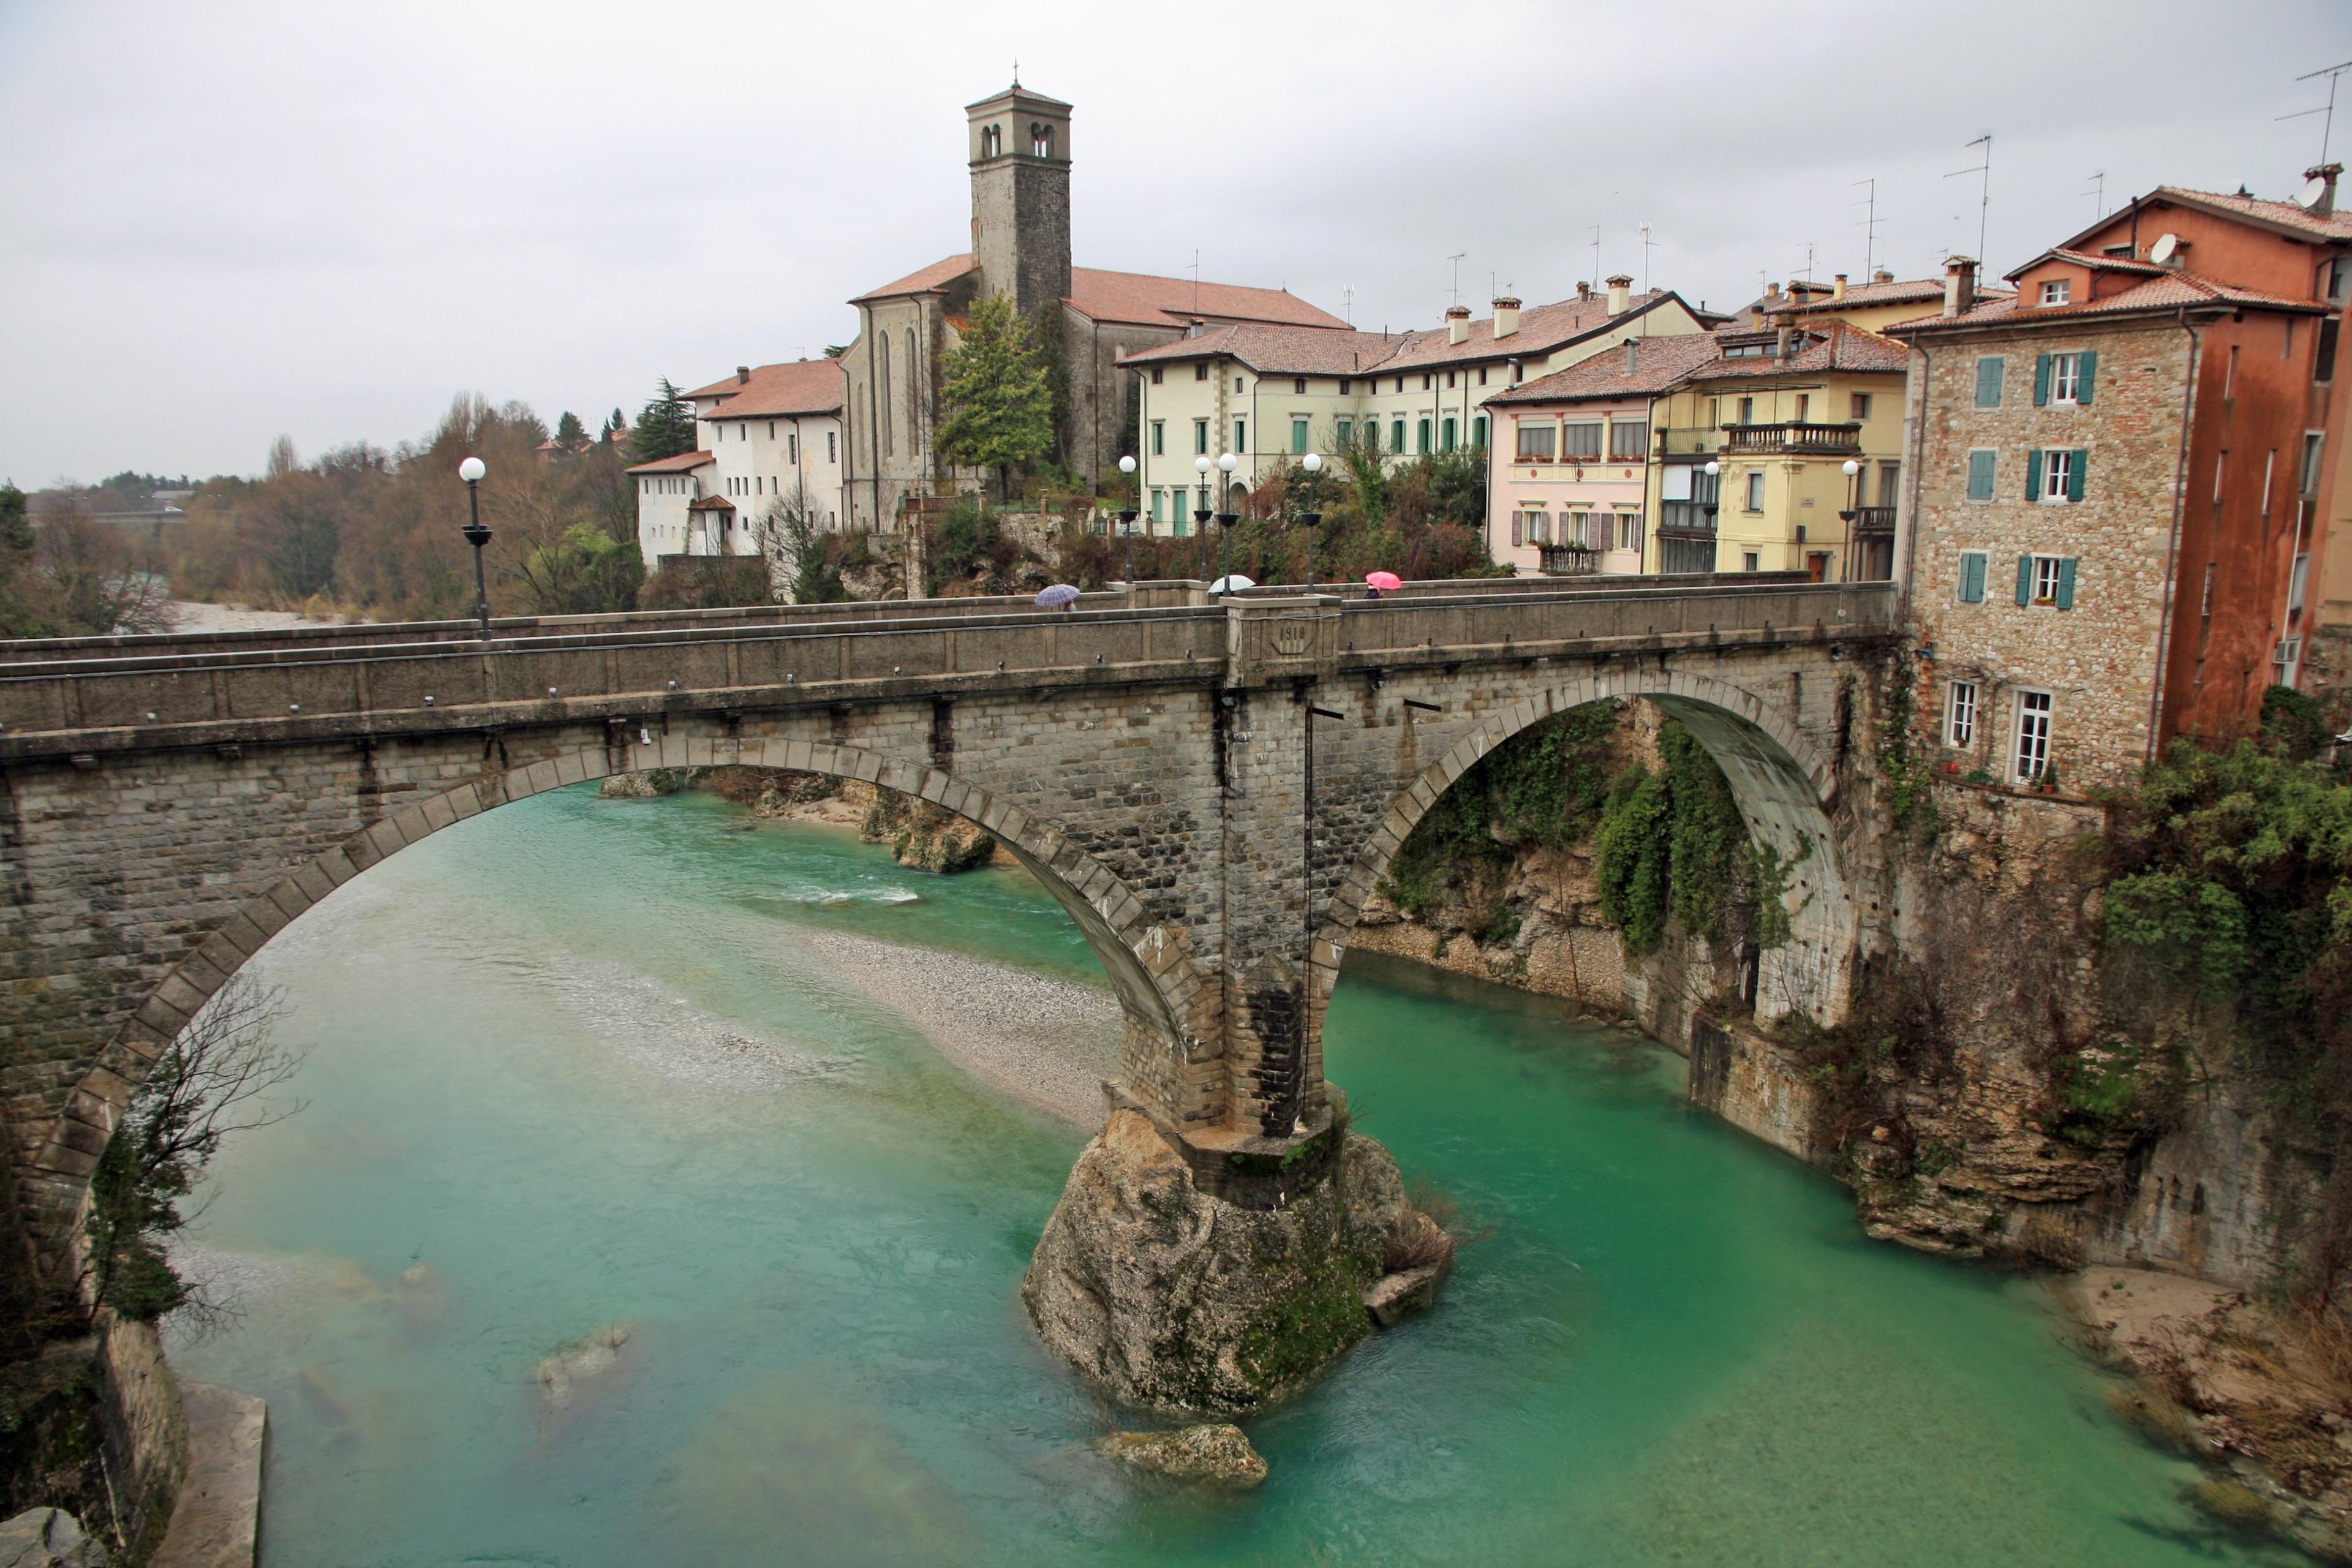 Cividale del Friuli, Friuli Venezia Giulia, Italy